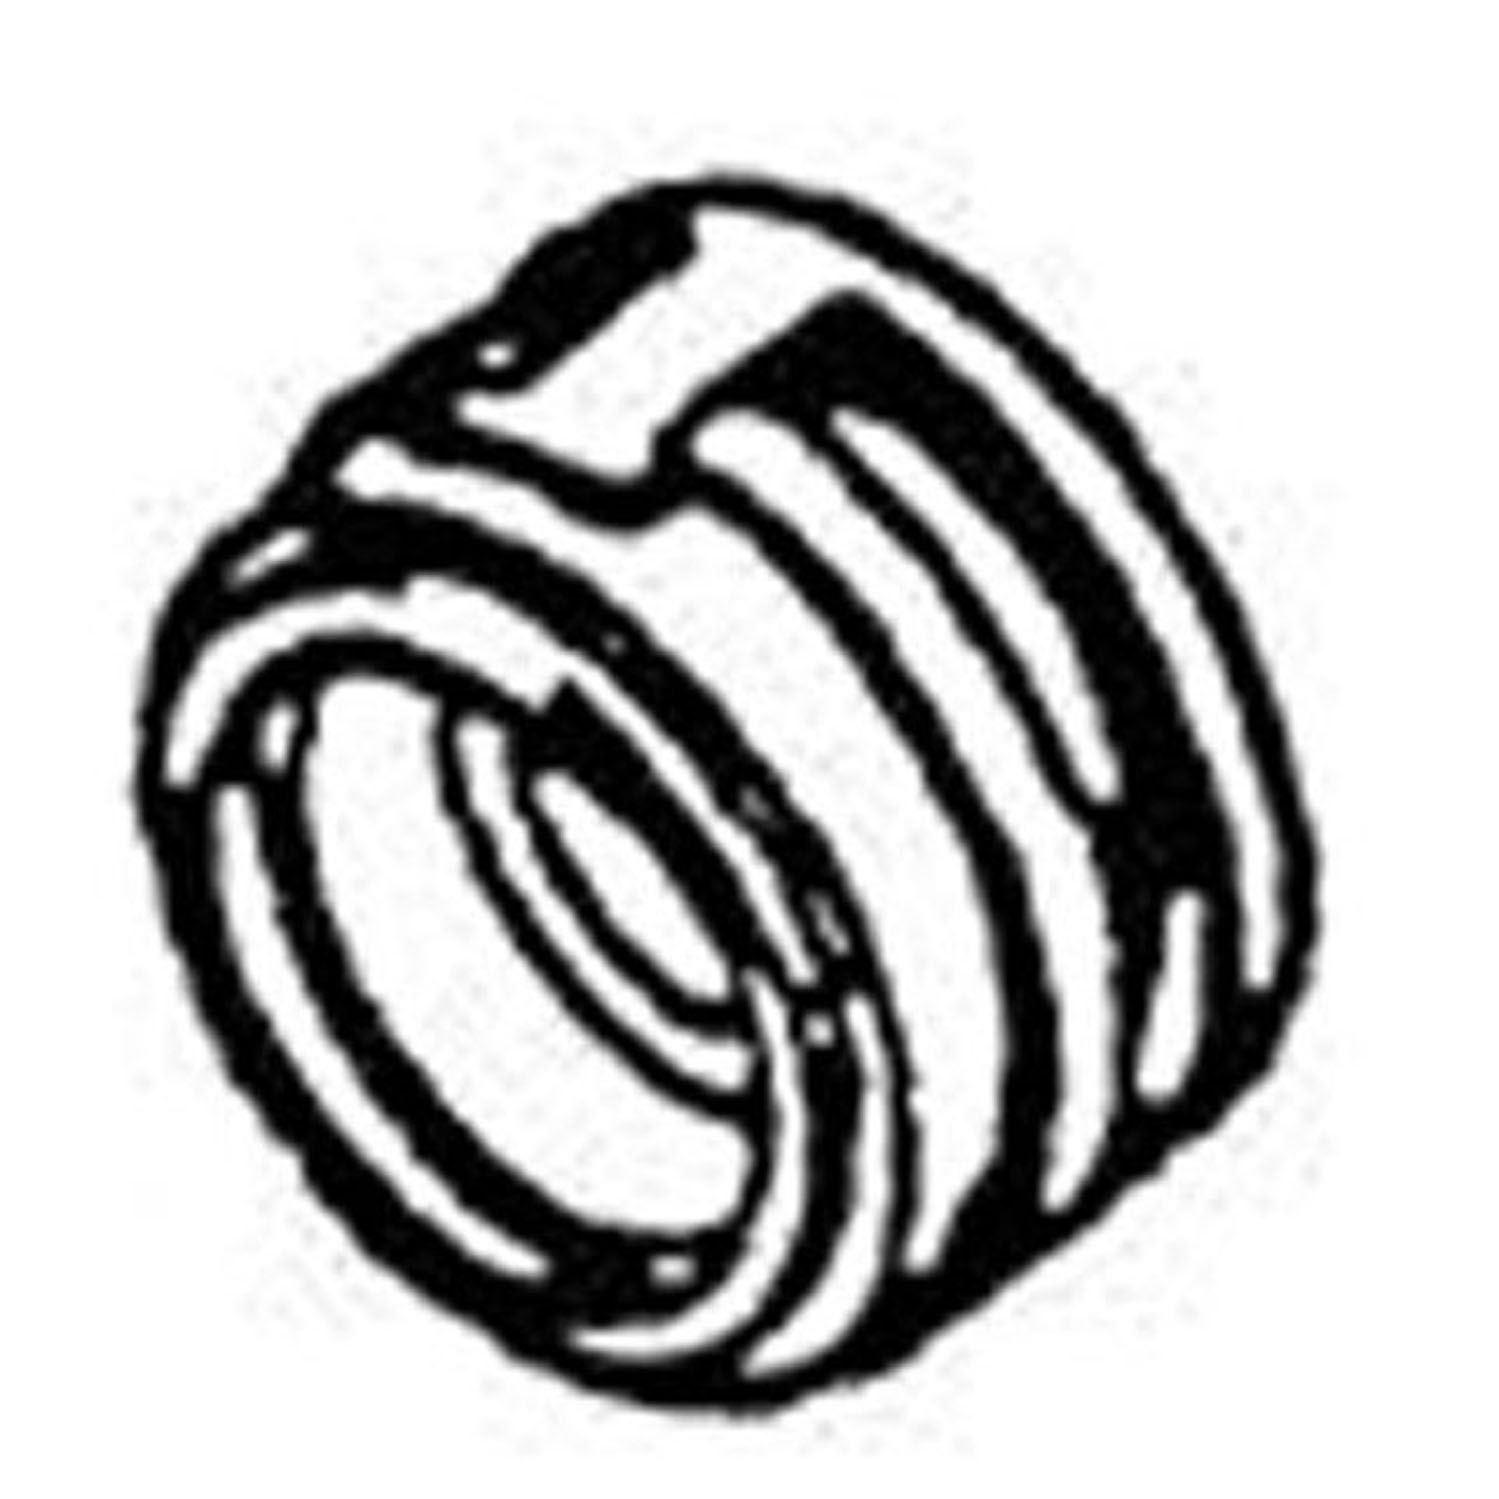 Shaft Seal FS6 C171 A590 6P134 6